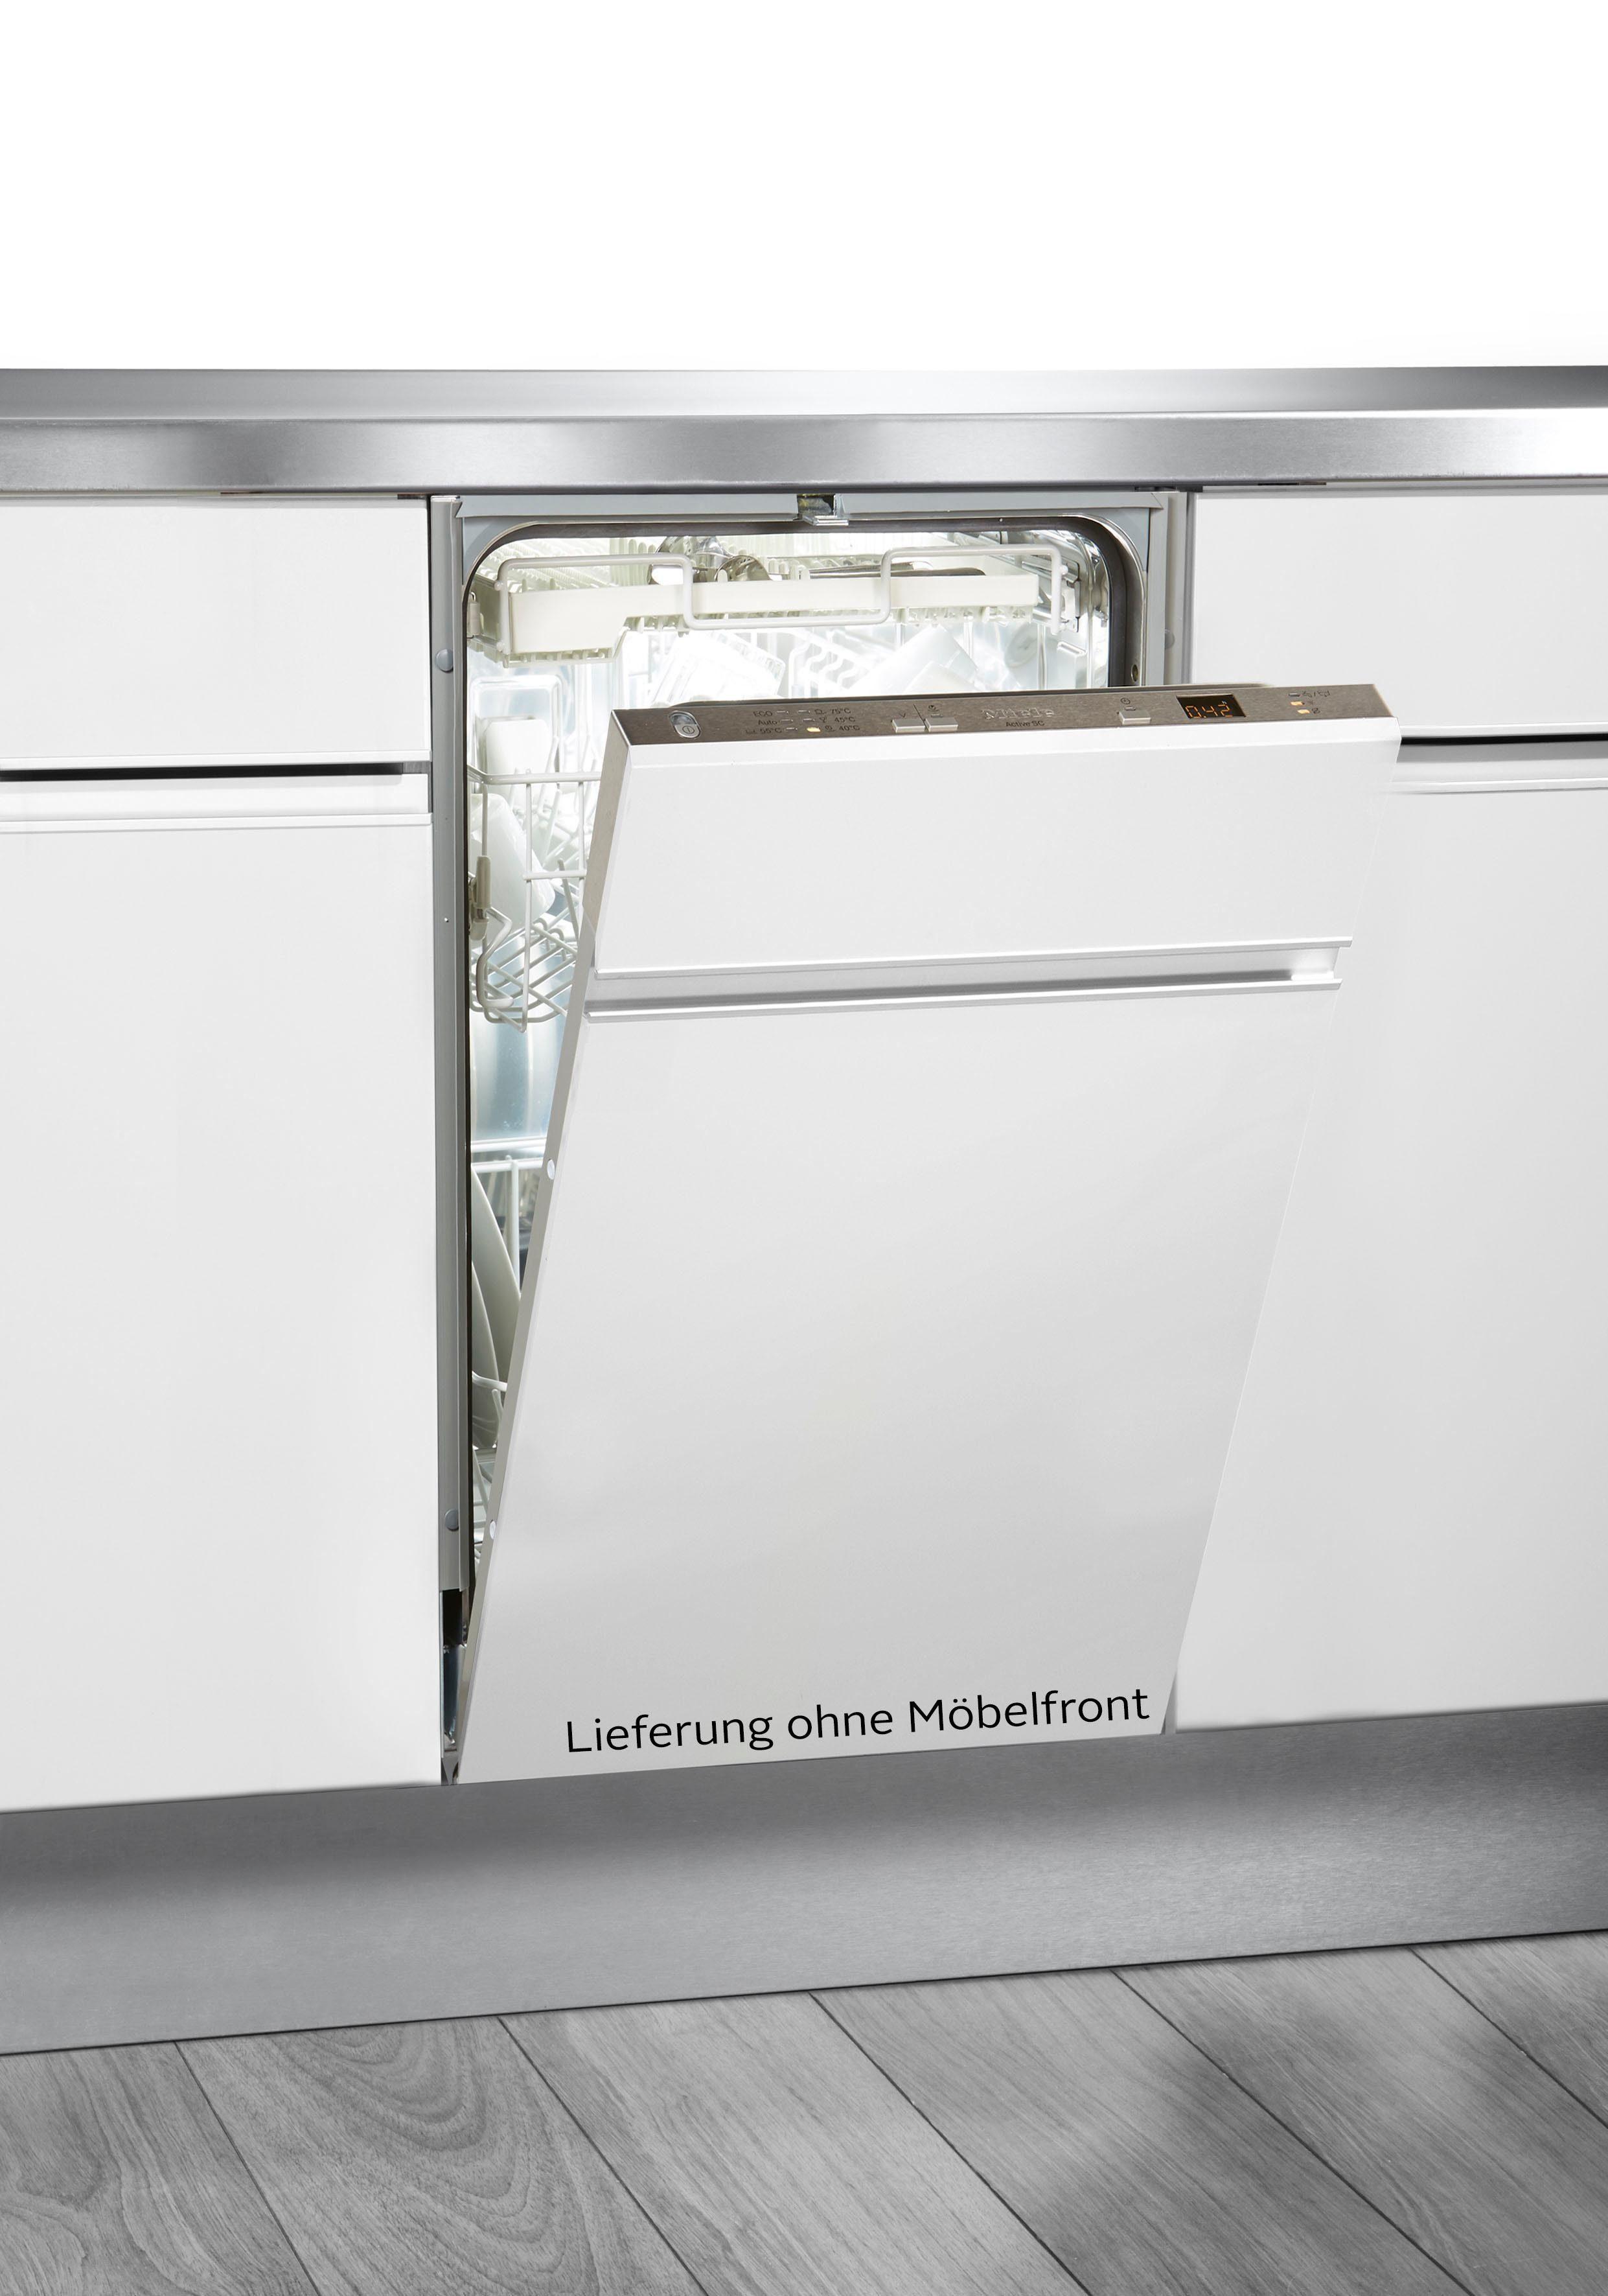 Miele vollintegrierbarer Geschirrspüler, G 4680 SCVi, 8,7 l, 9 Maßgedecke, 45 cm breit